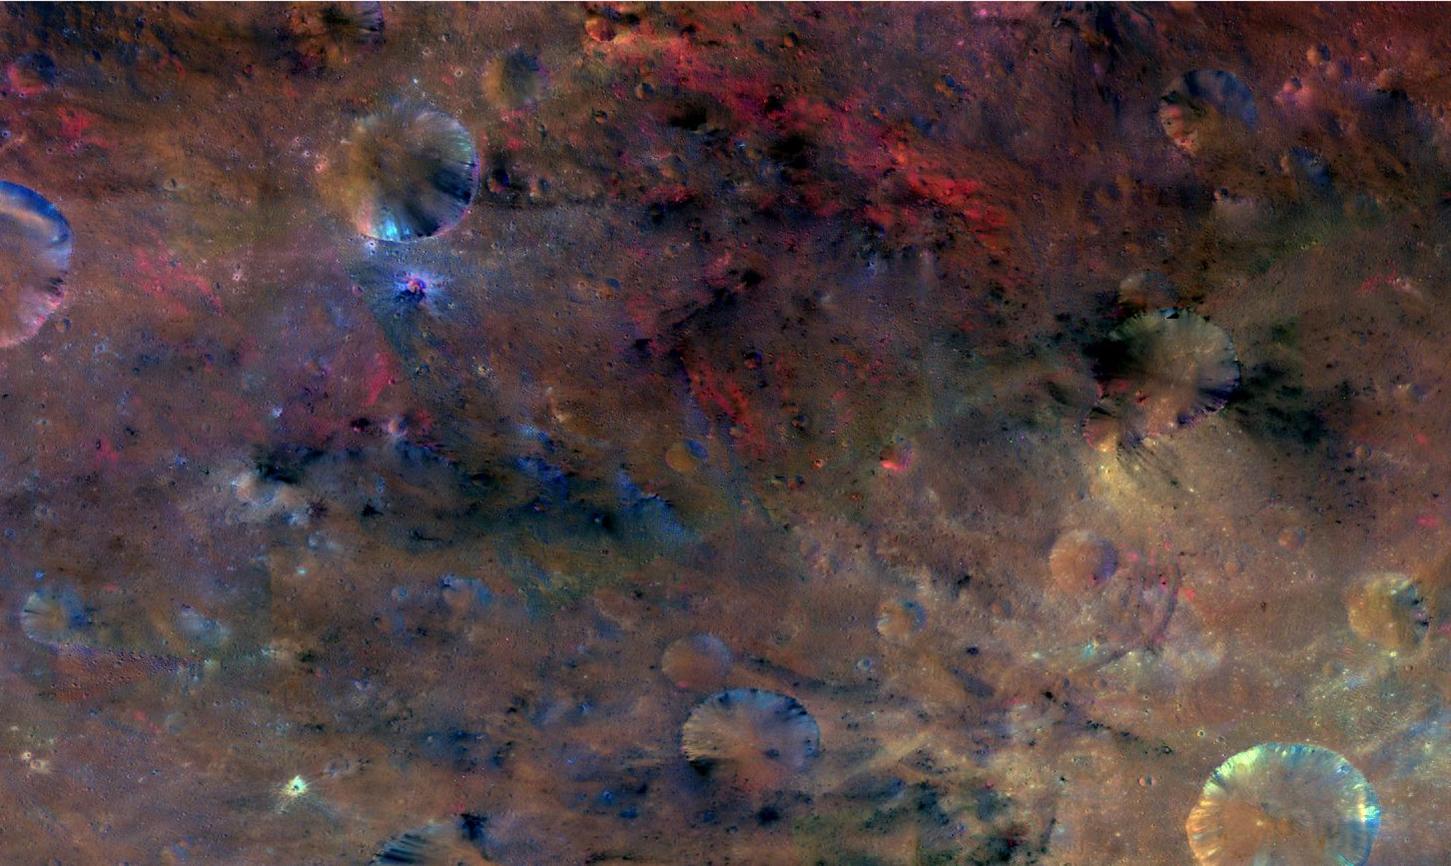 Vesta's Many Colors at Sextilia | NASA